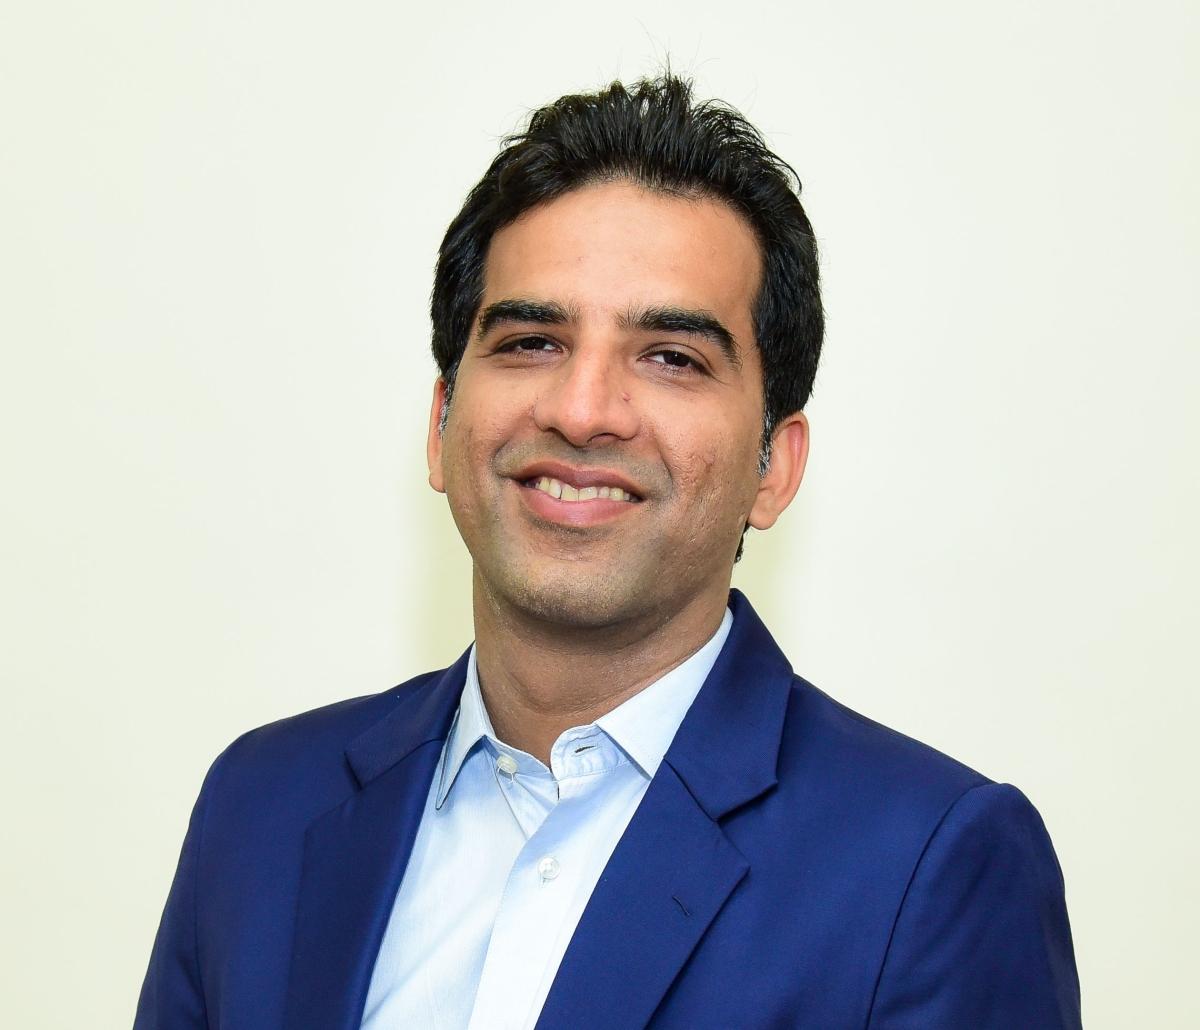 Zameer Kochar, VP – marketing and member engagement, InterMiles